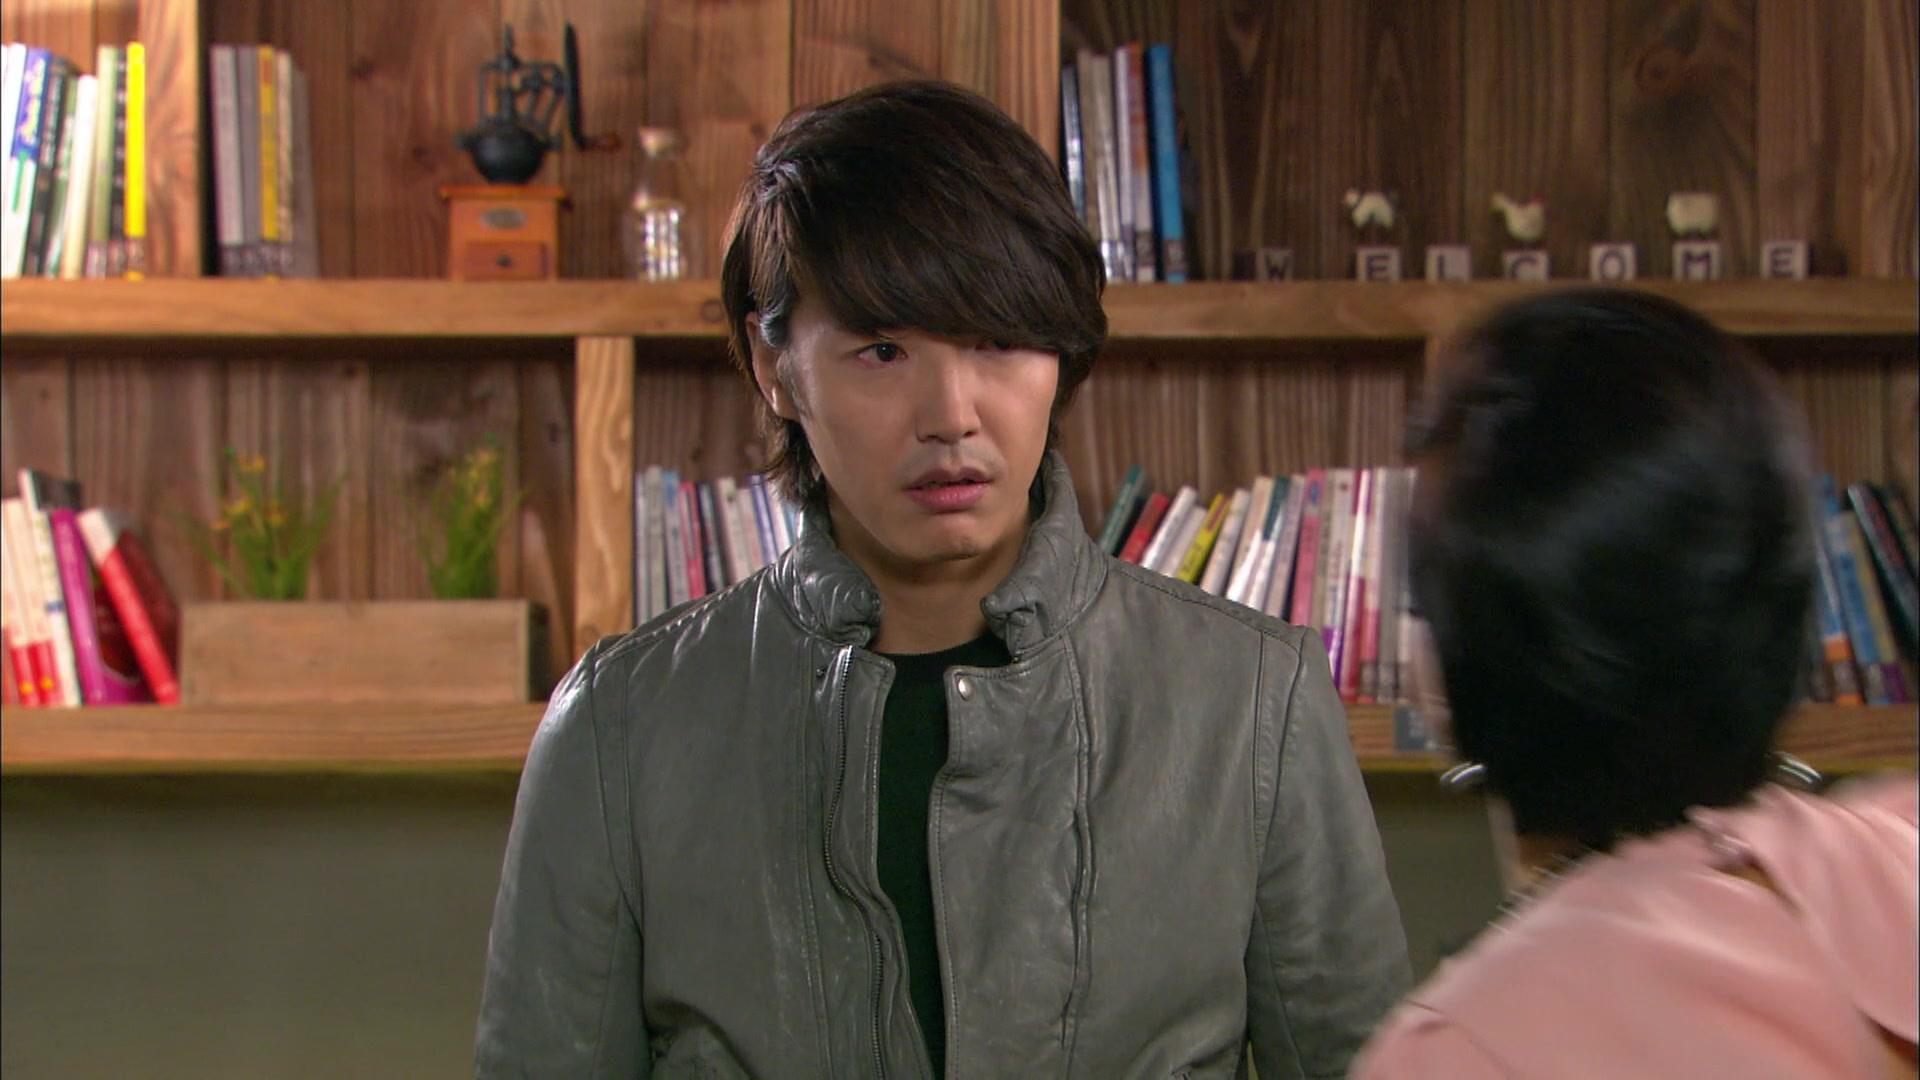 Secret Garden - 시크릿 가든 - Watch Full Episodes Free - Korea - TV